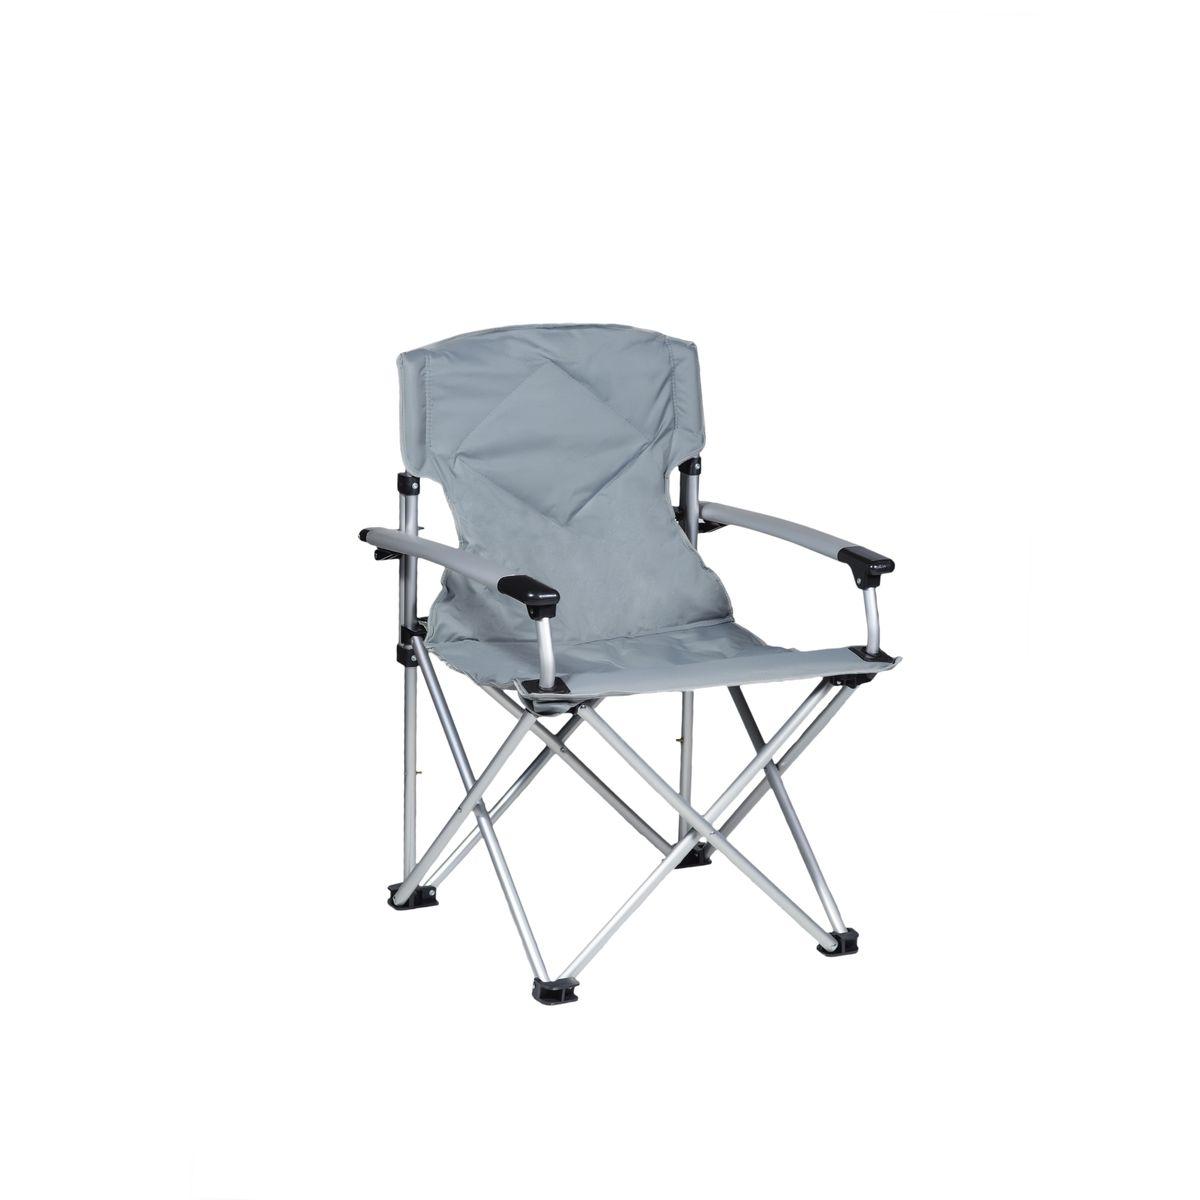 "Кресло складное Green Glade ""M2306"", 65 см х 66 см х 95 см М2306"